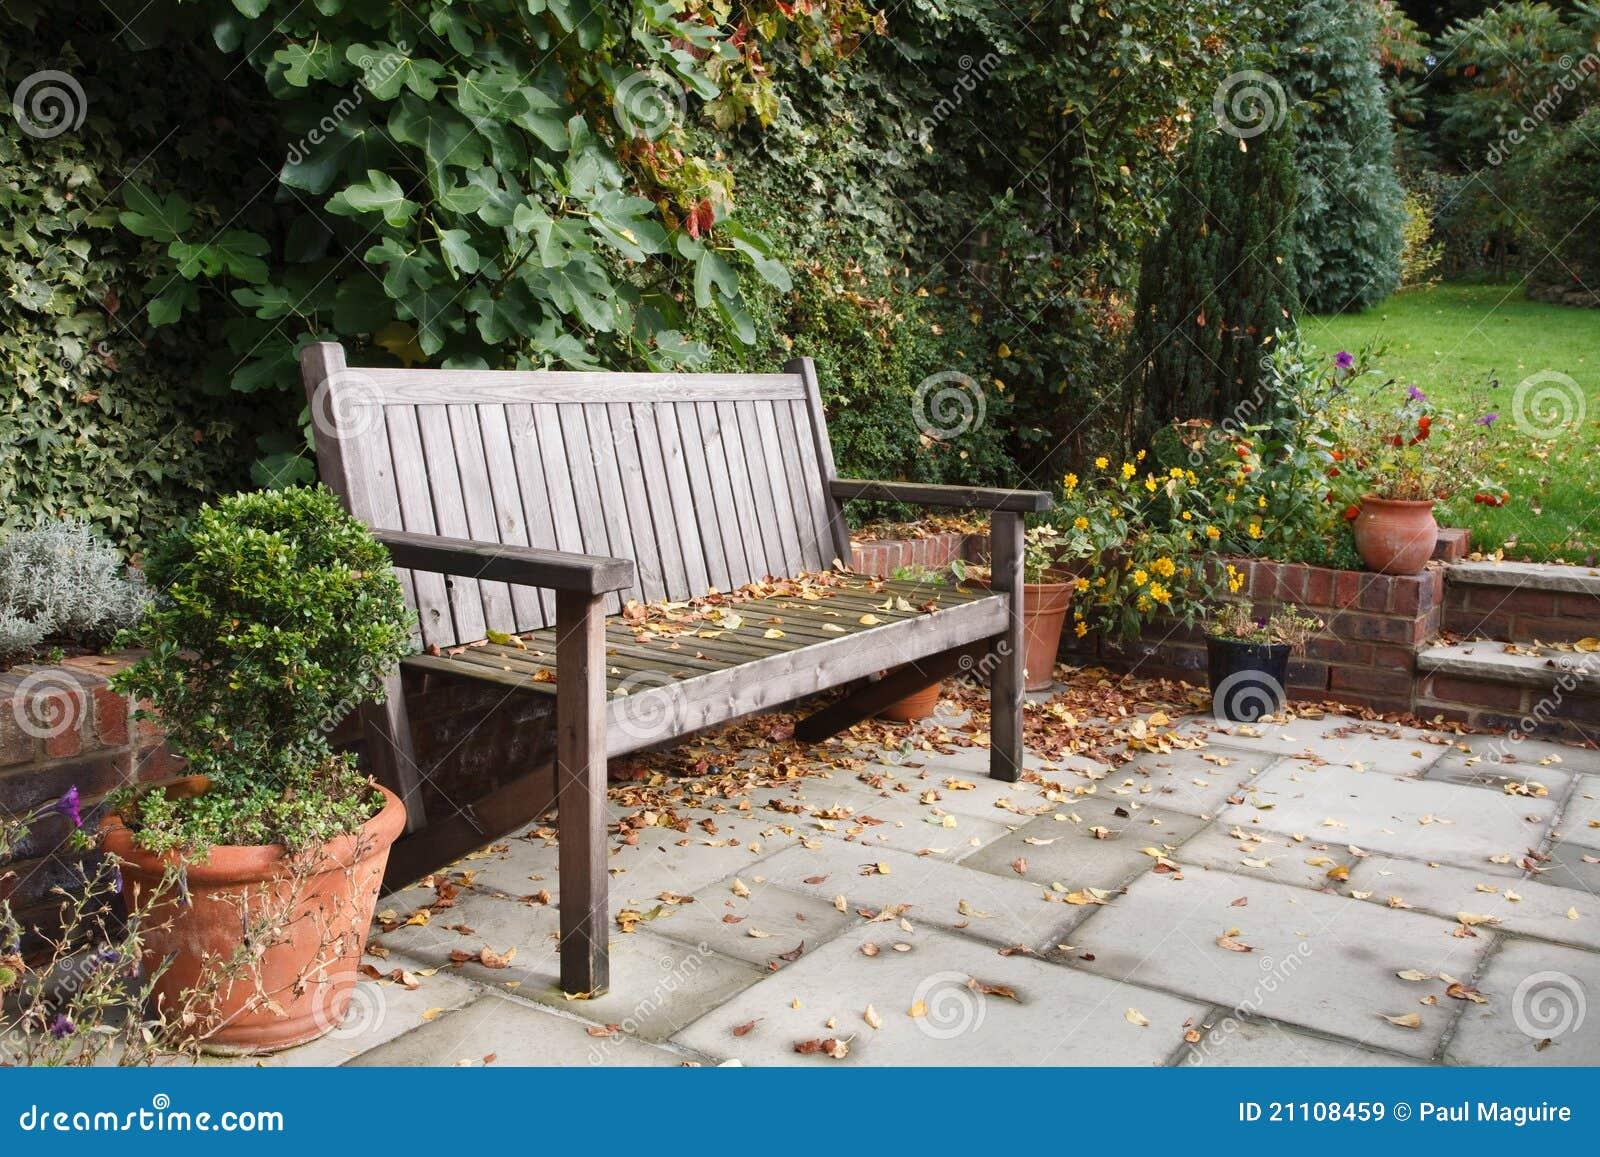 Garden bench in fall